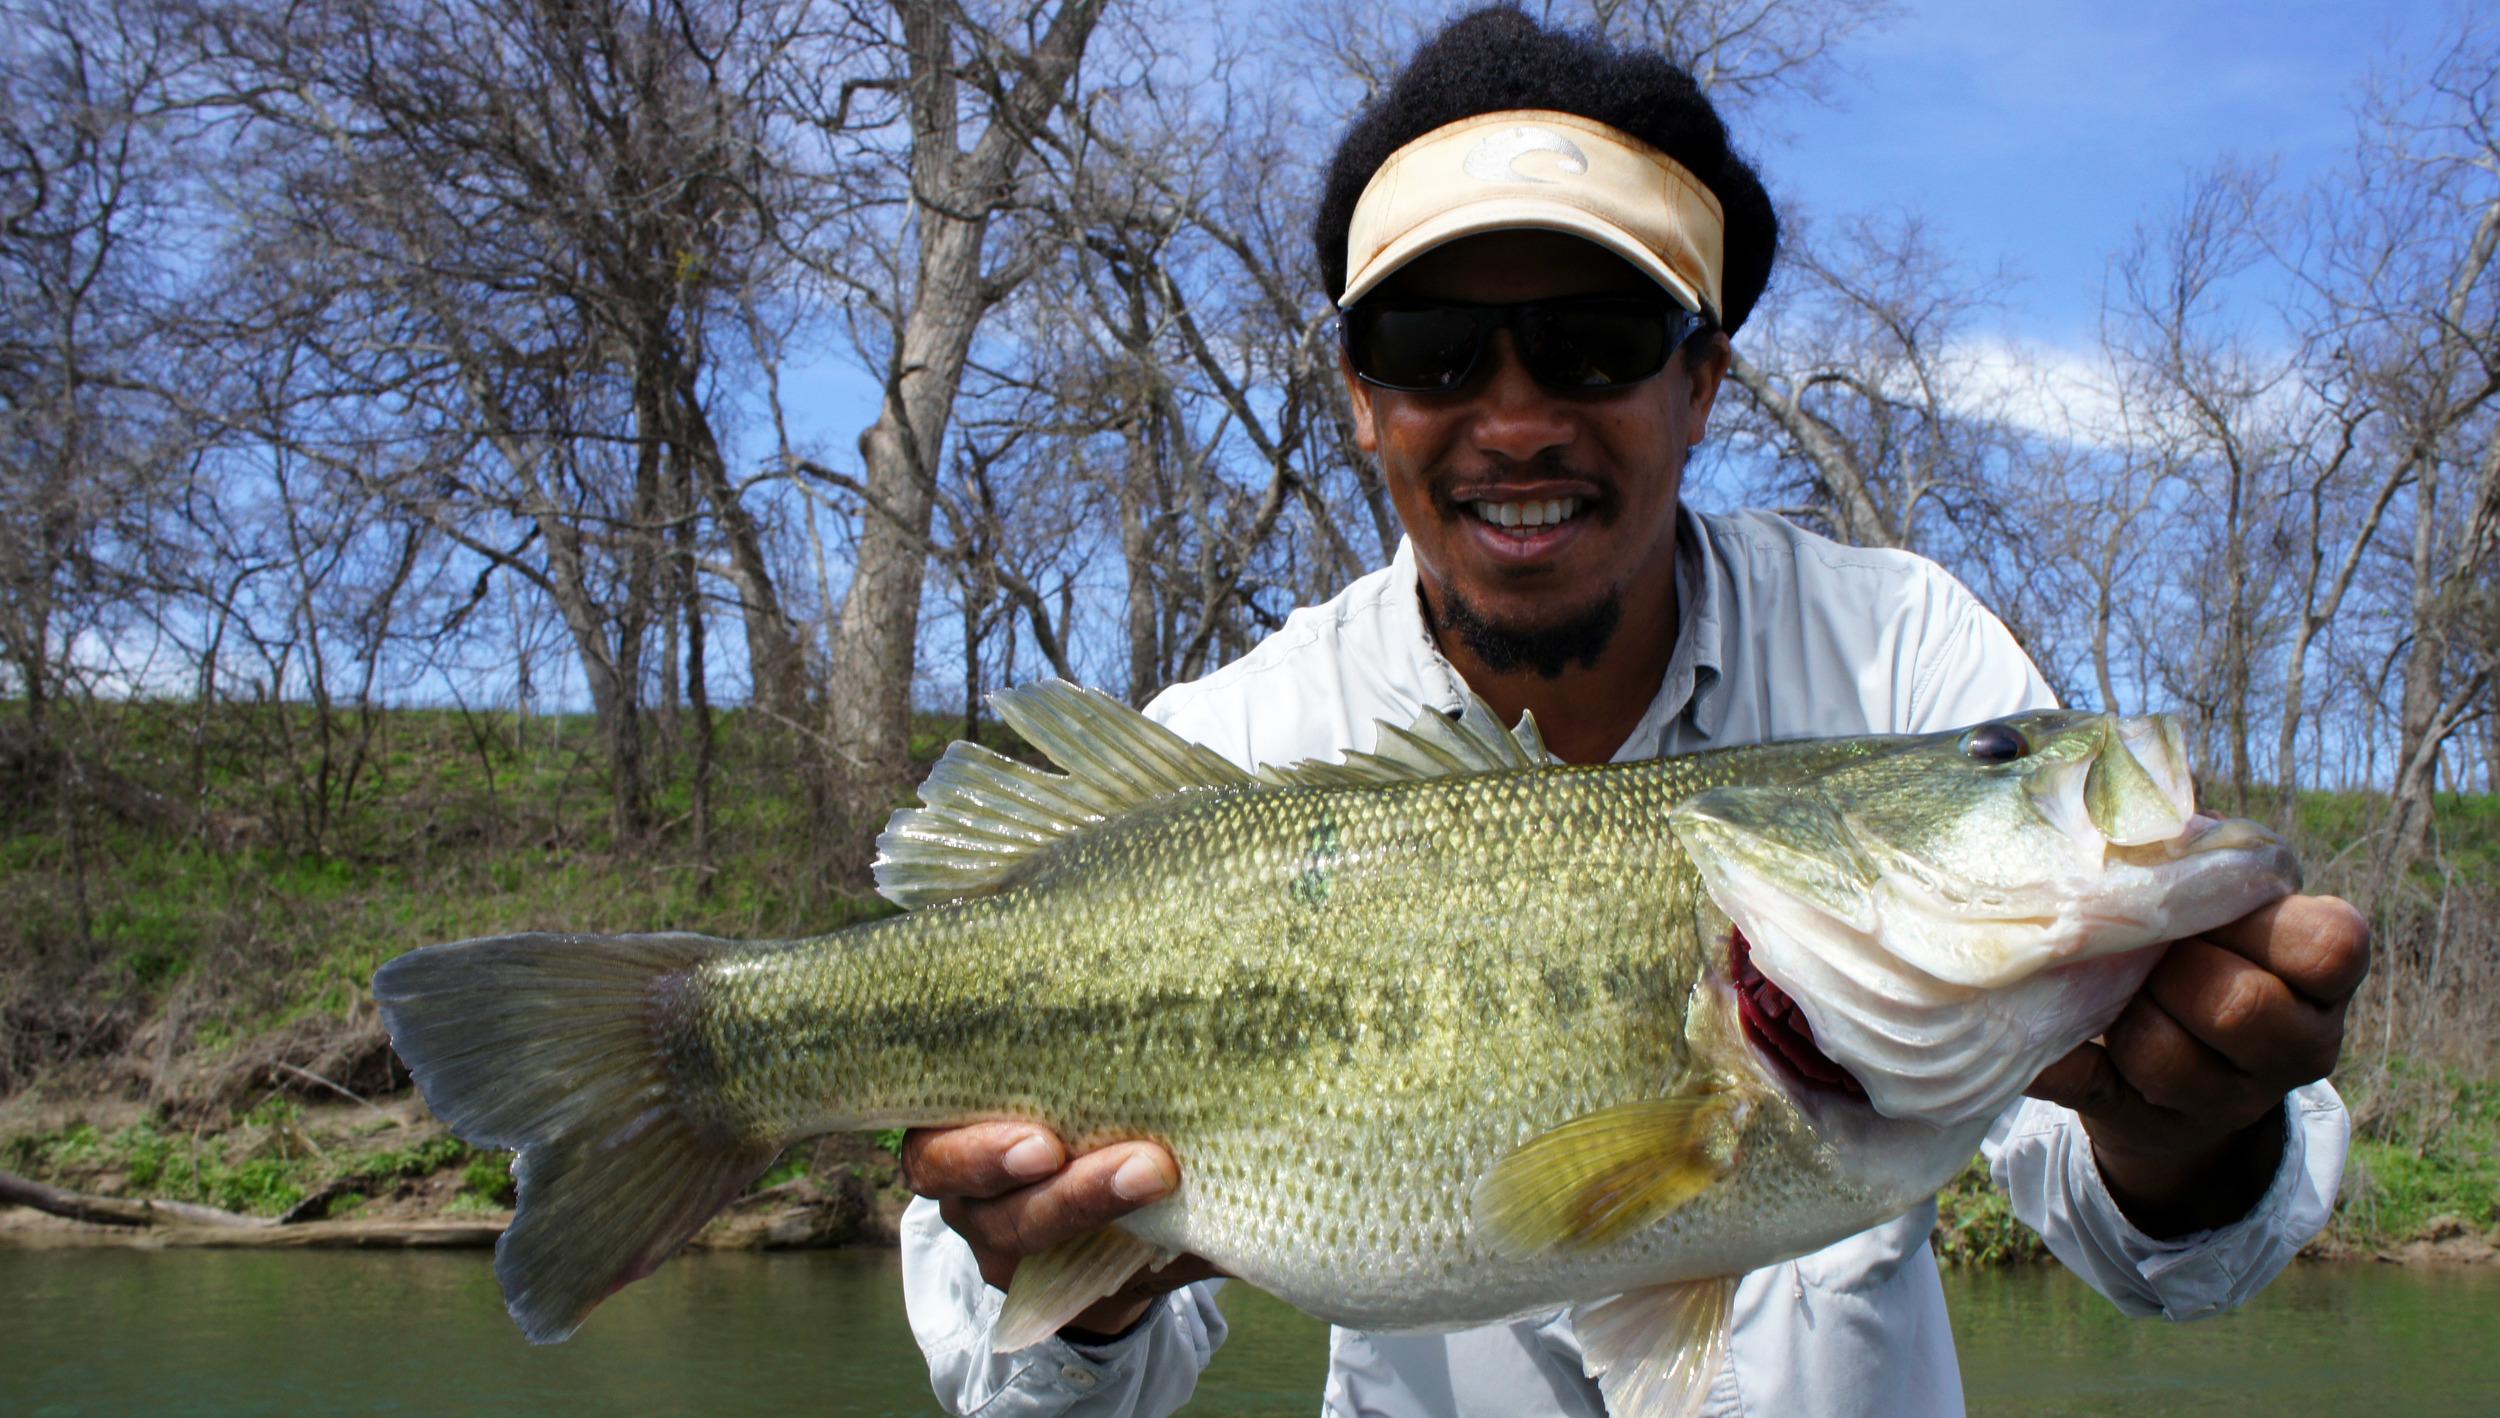 Alvin with a huge Colorado River bass